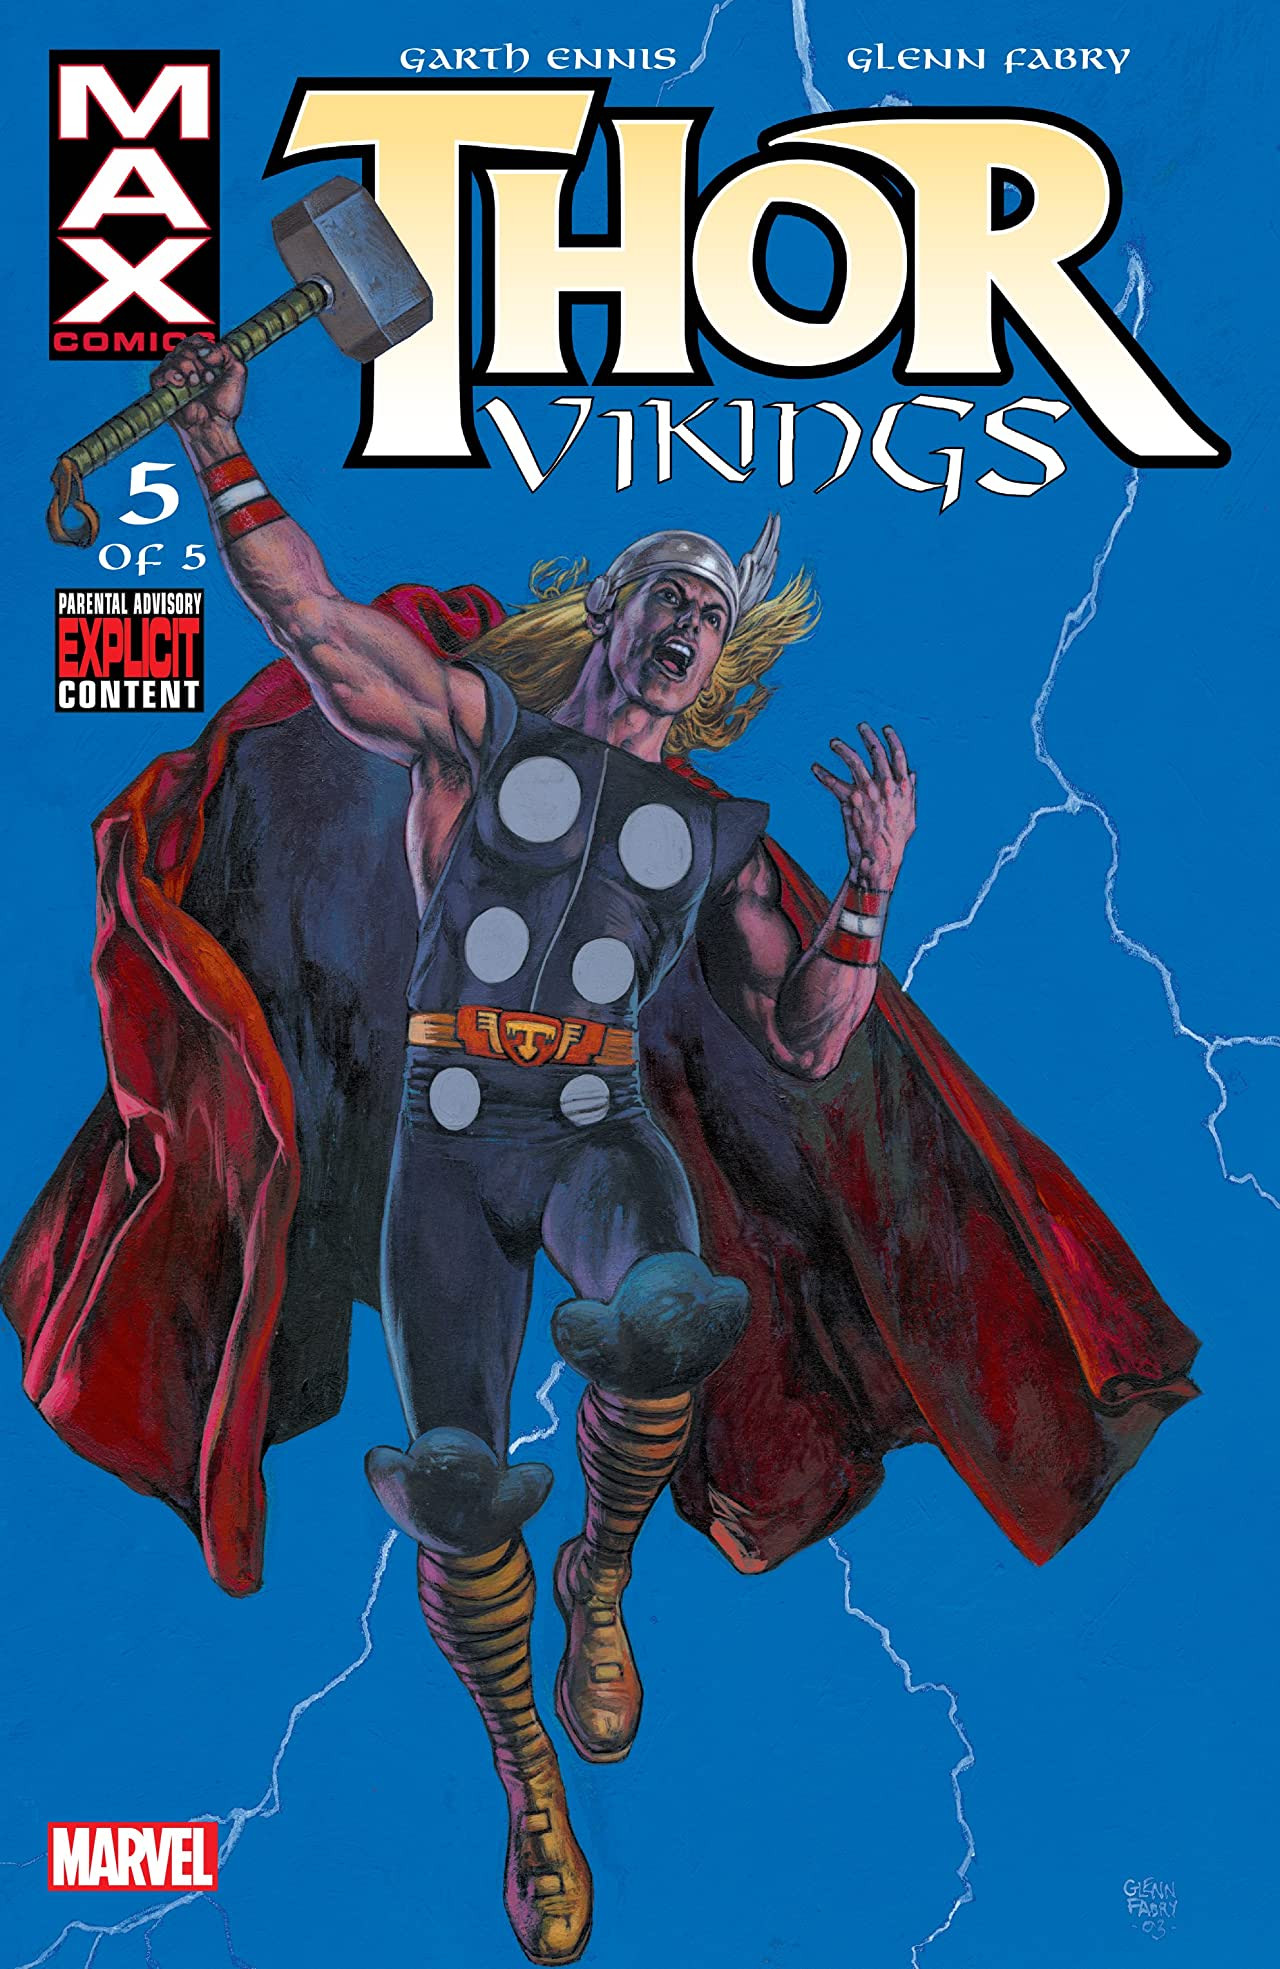 Thor Vikings Vol 1 5.jpg